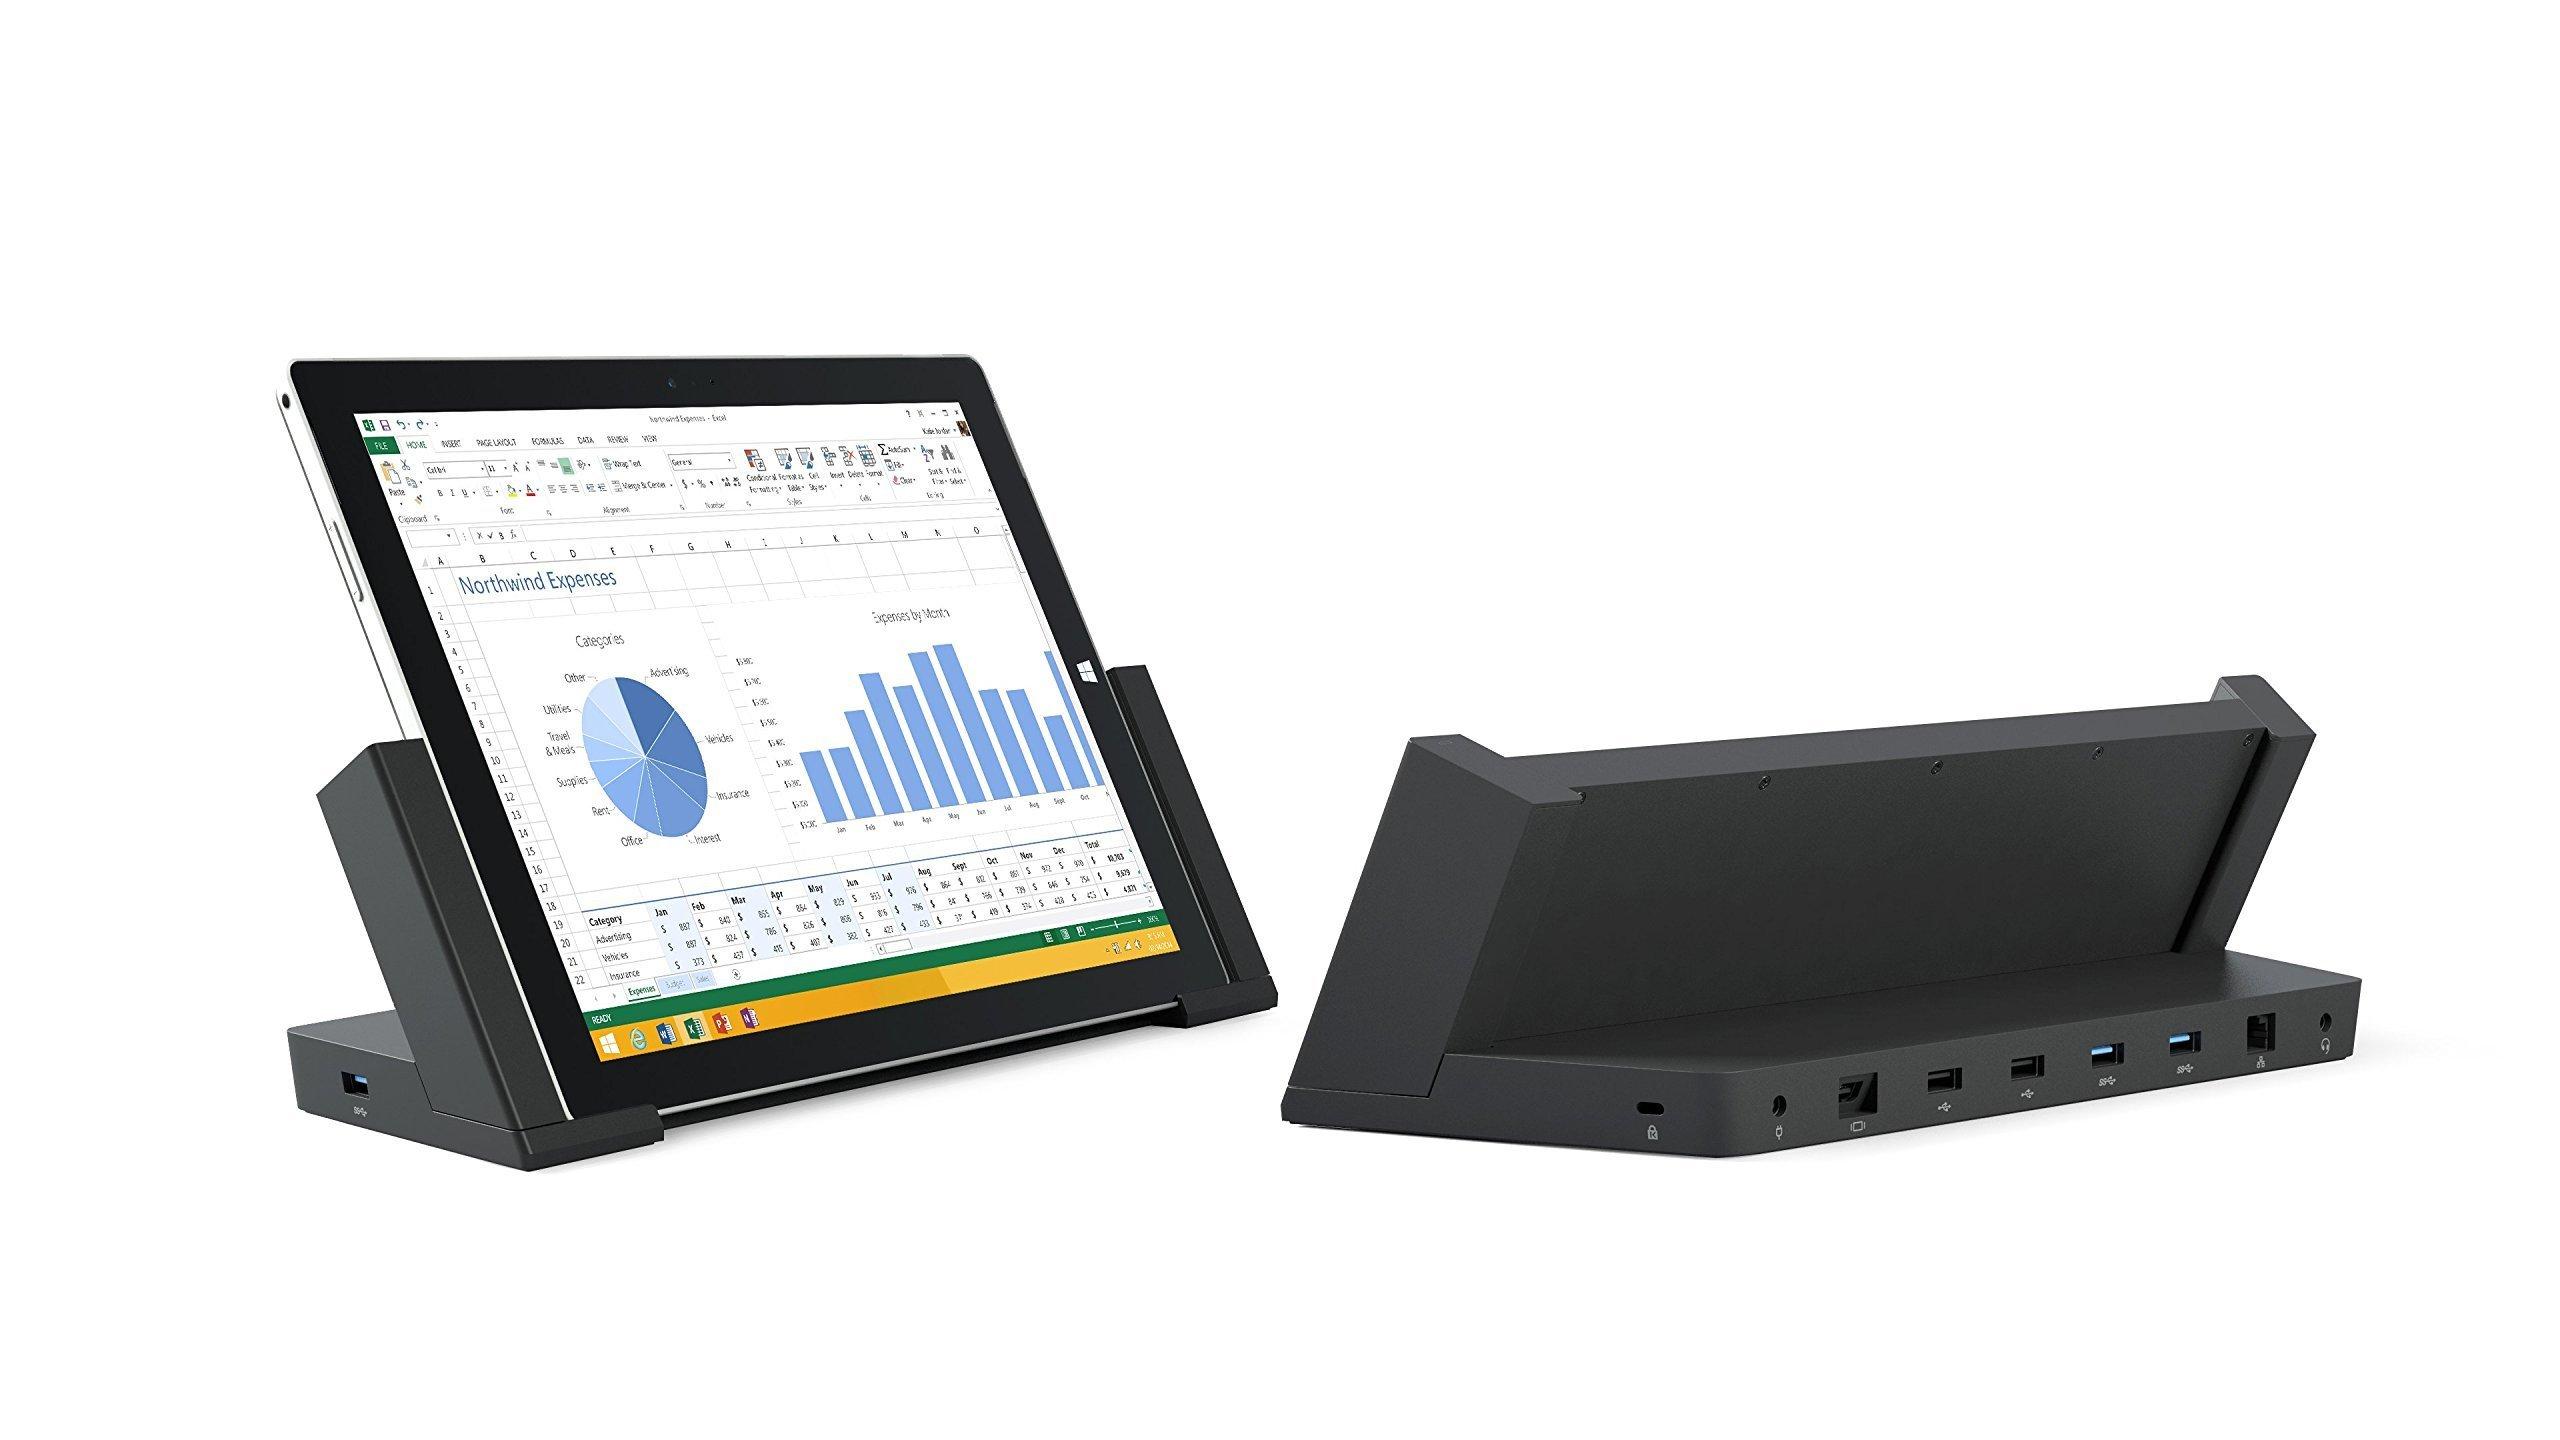 Microsoft Docking Station for Surface Pro 3 3Q9-00001 (Renewed) by Microsoft (Image #3)